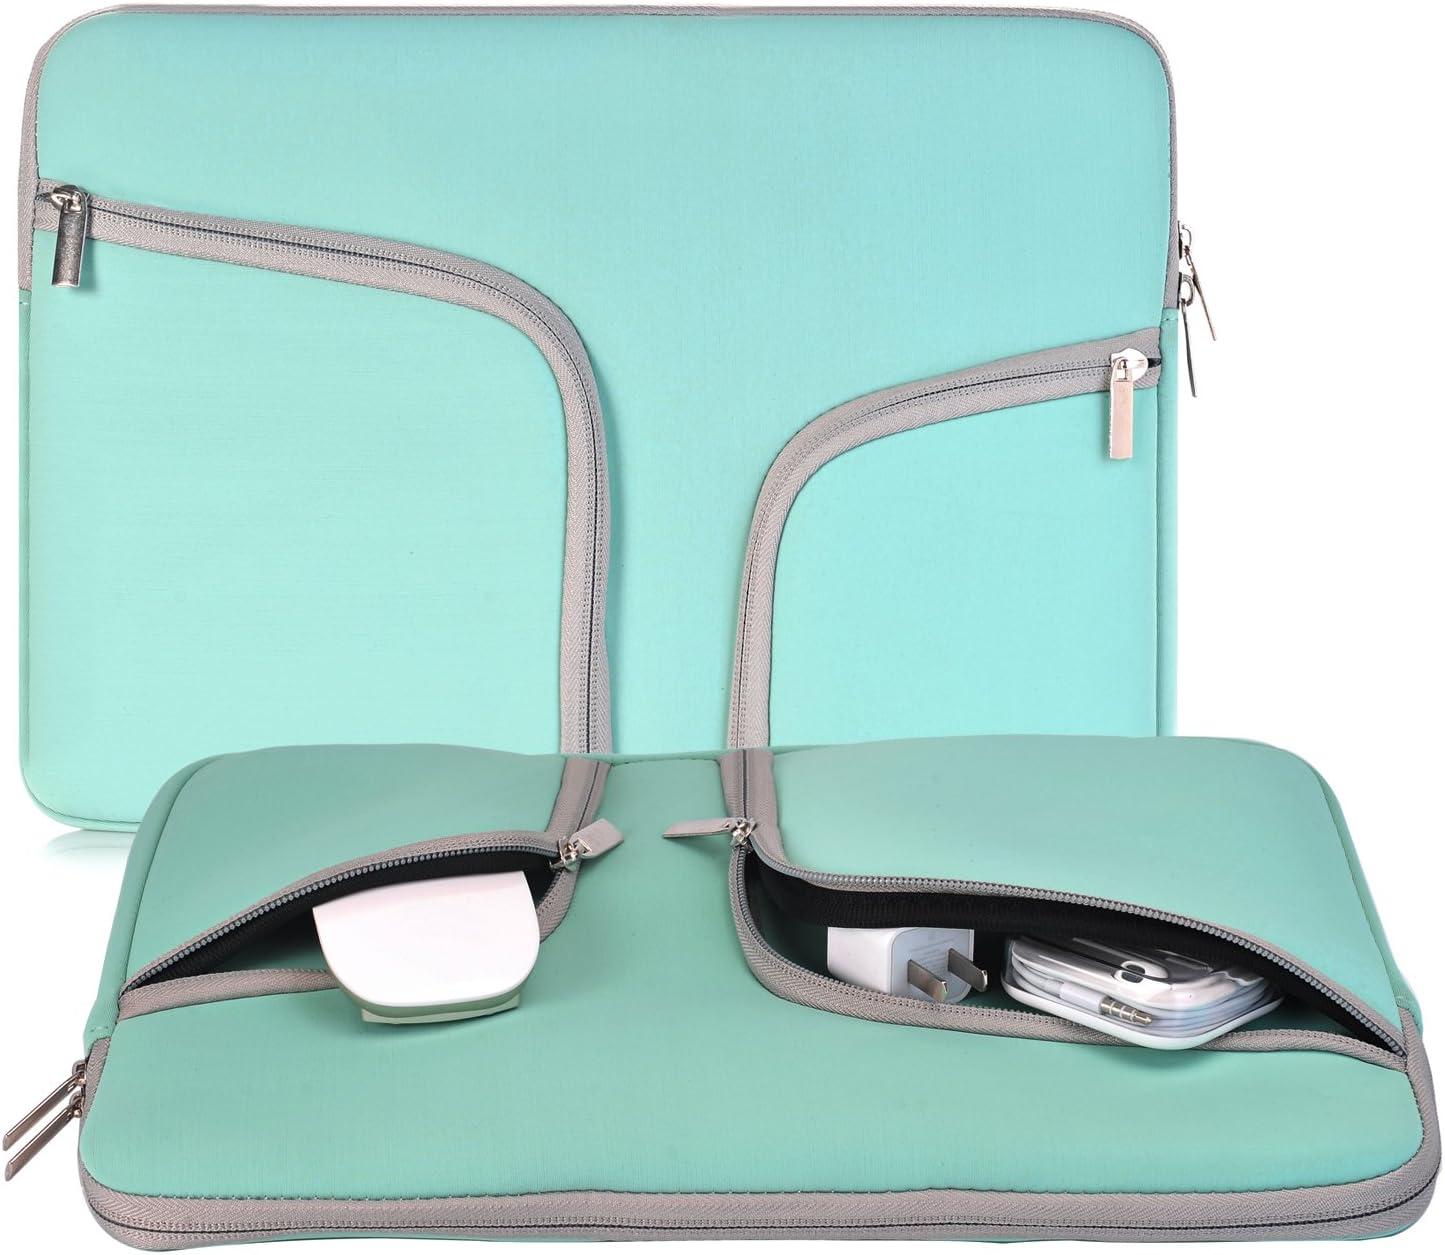 Egiant 14-15.4 Inch Laptop Sleeve Case Bag